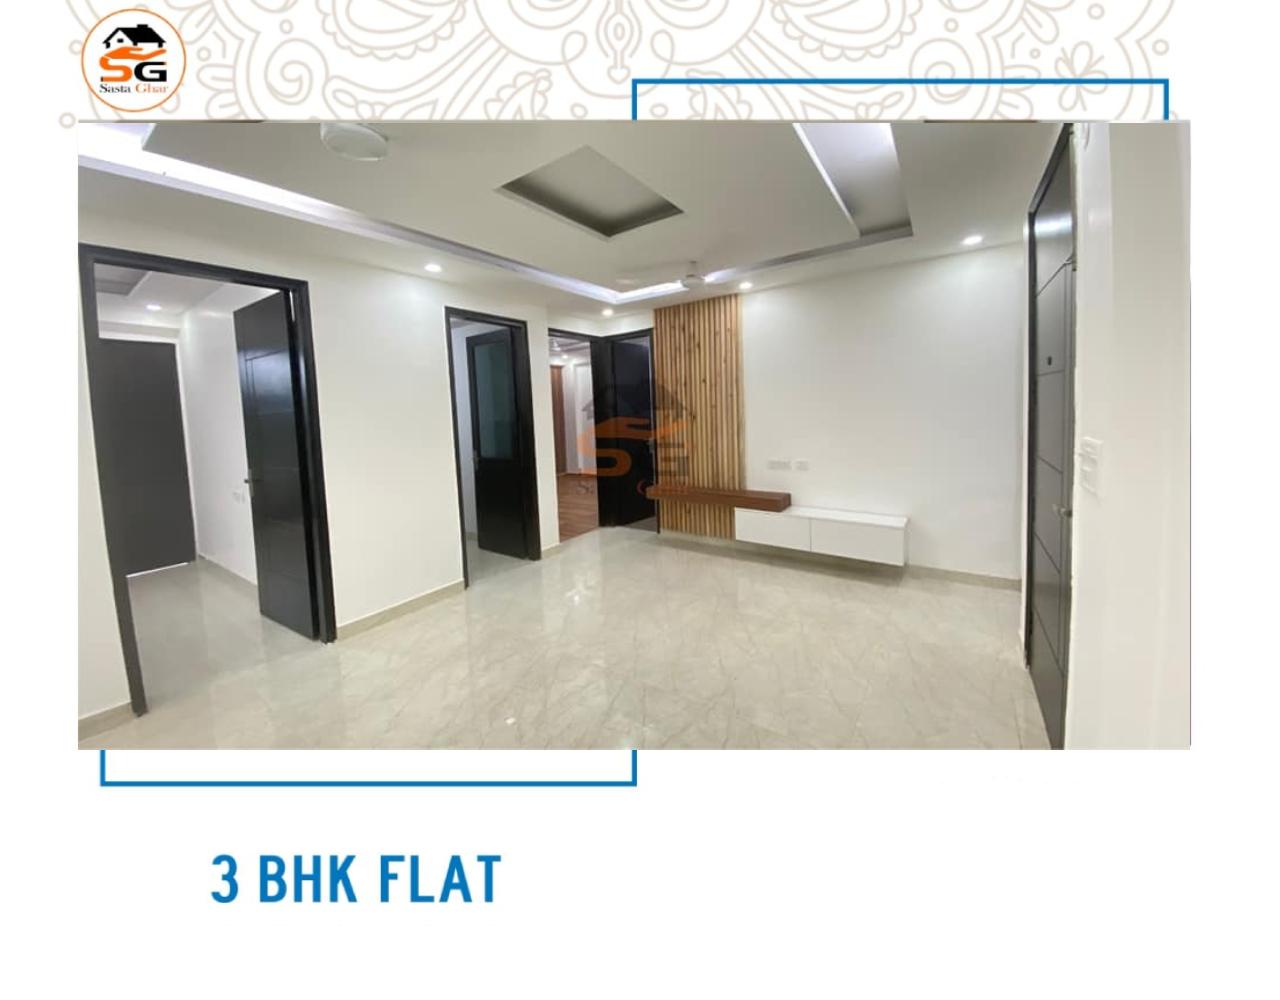 3 BHK flat for sale in Chattarpur Delhi